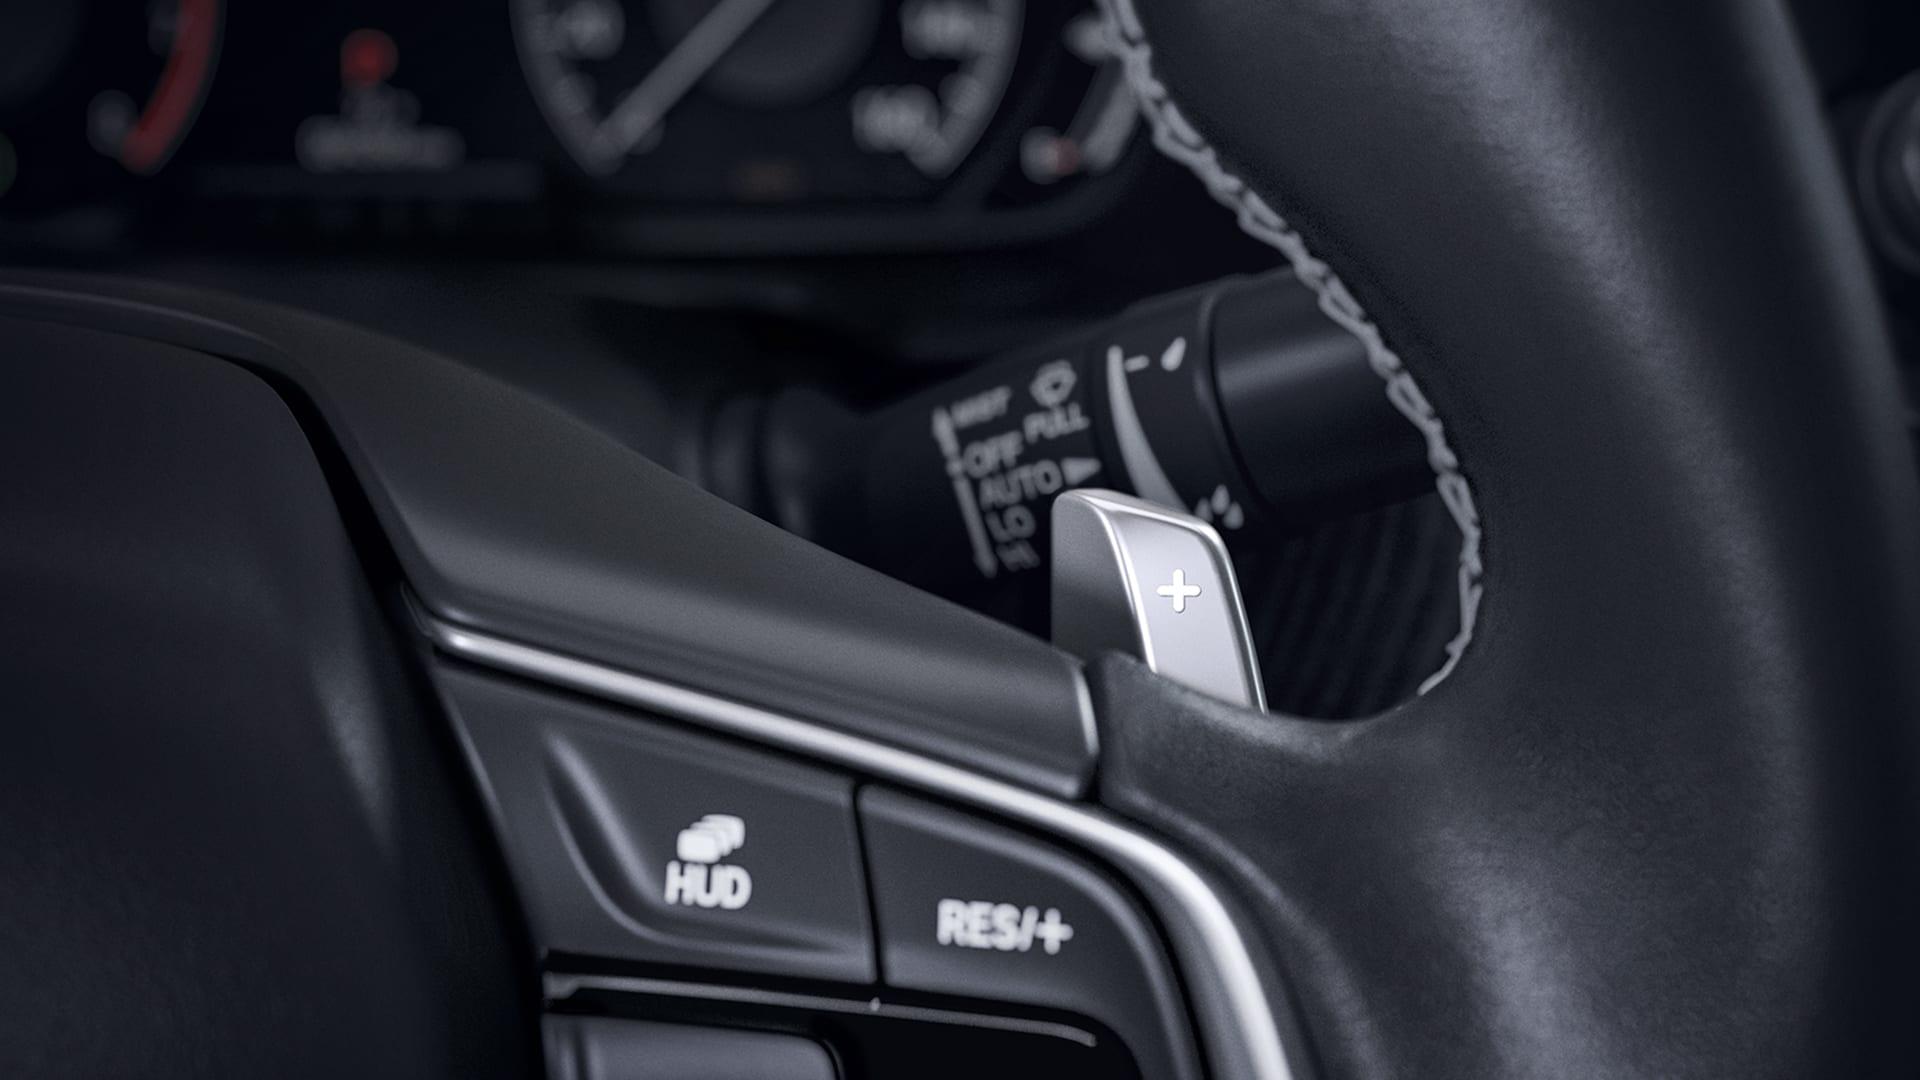 Accord - Trocas de marchas no volante (Paddle Shift)